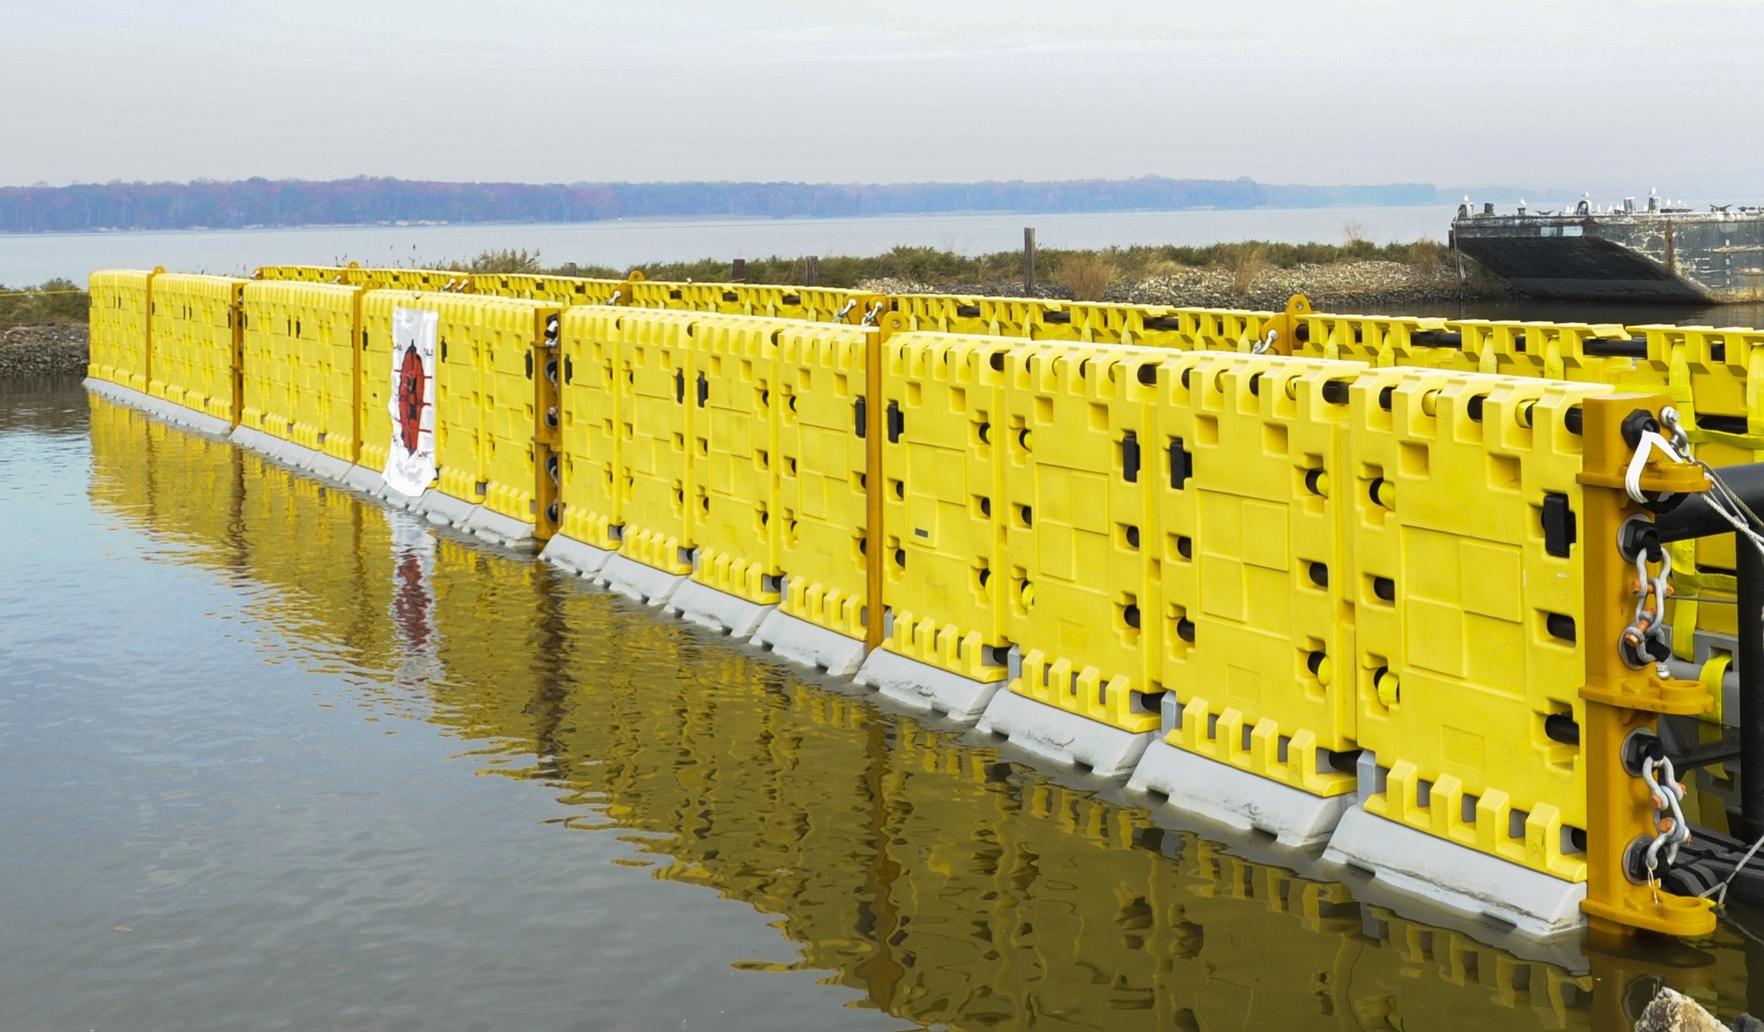 HALO SENTINEL® catamaran style structure maximizes stopping ability by providing redundant impact nets.